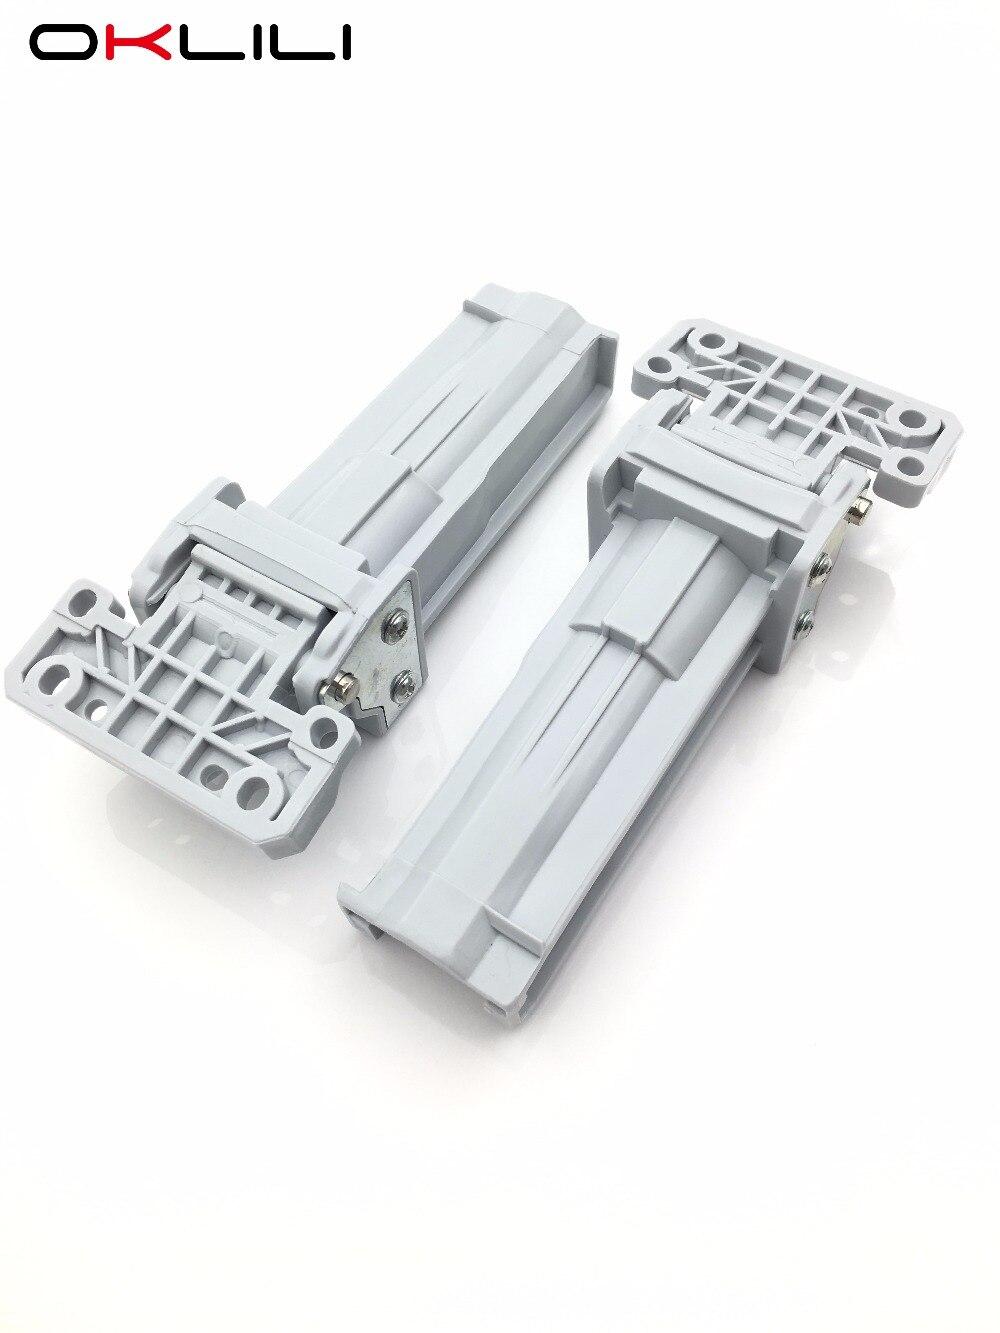 2PCX جديد Q7404-60029 Q7404-60024 Q7404-60025 ADF المفصلي الجمعية ASM ASSY-HINGE-HR ل HP 500 MFP M525 M575 M521 CM4540